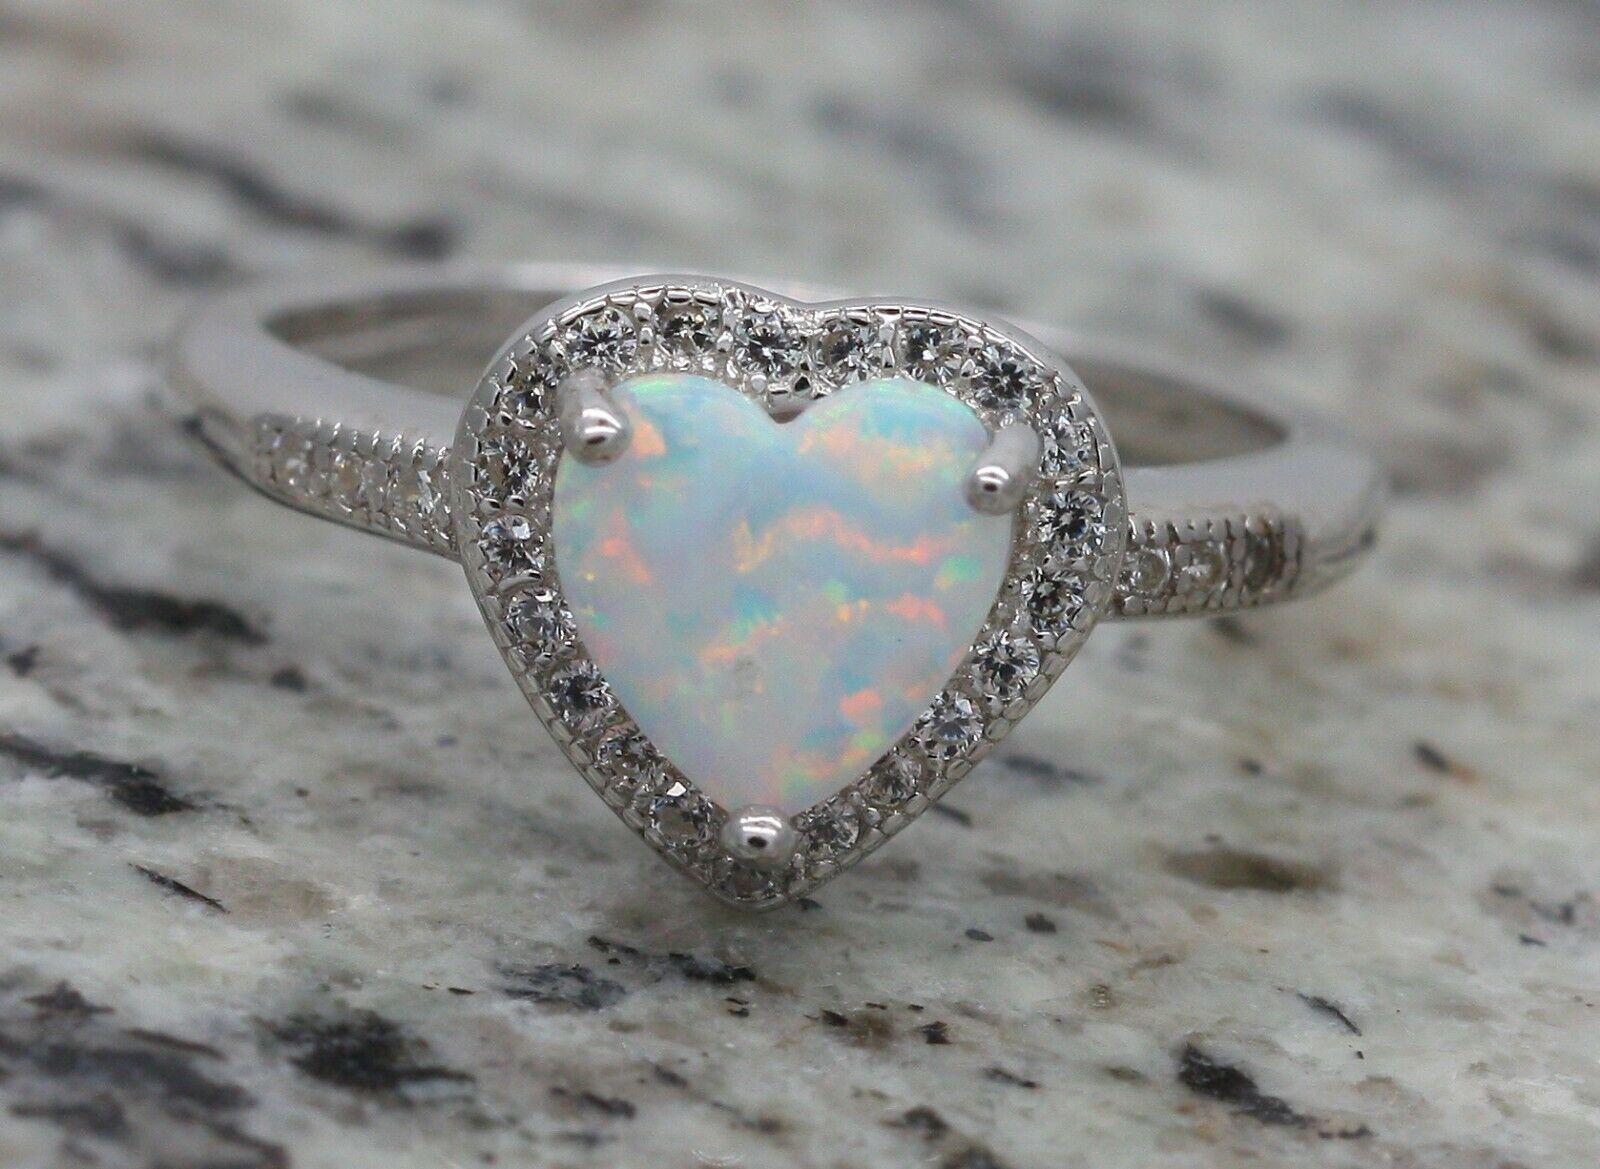 Bjc silver Sterling Fiery white Opale & Zircone Cœur Amour Bague size O